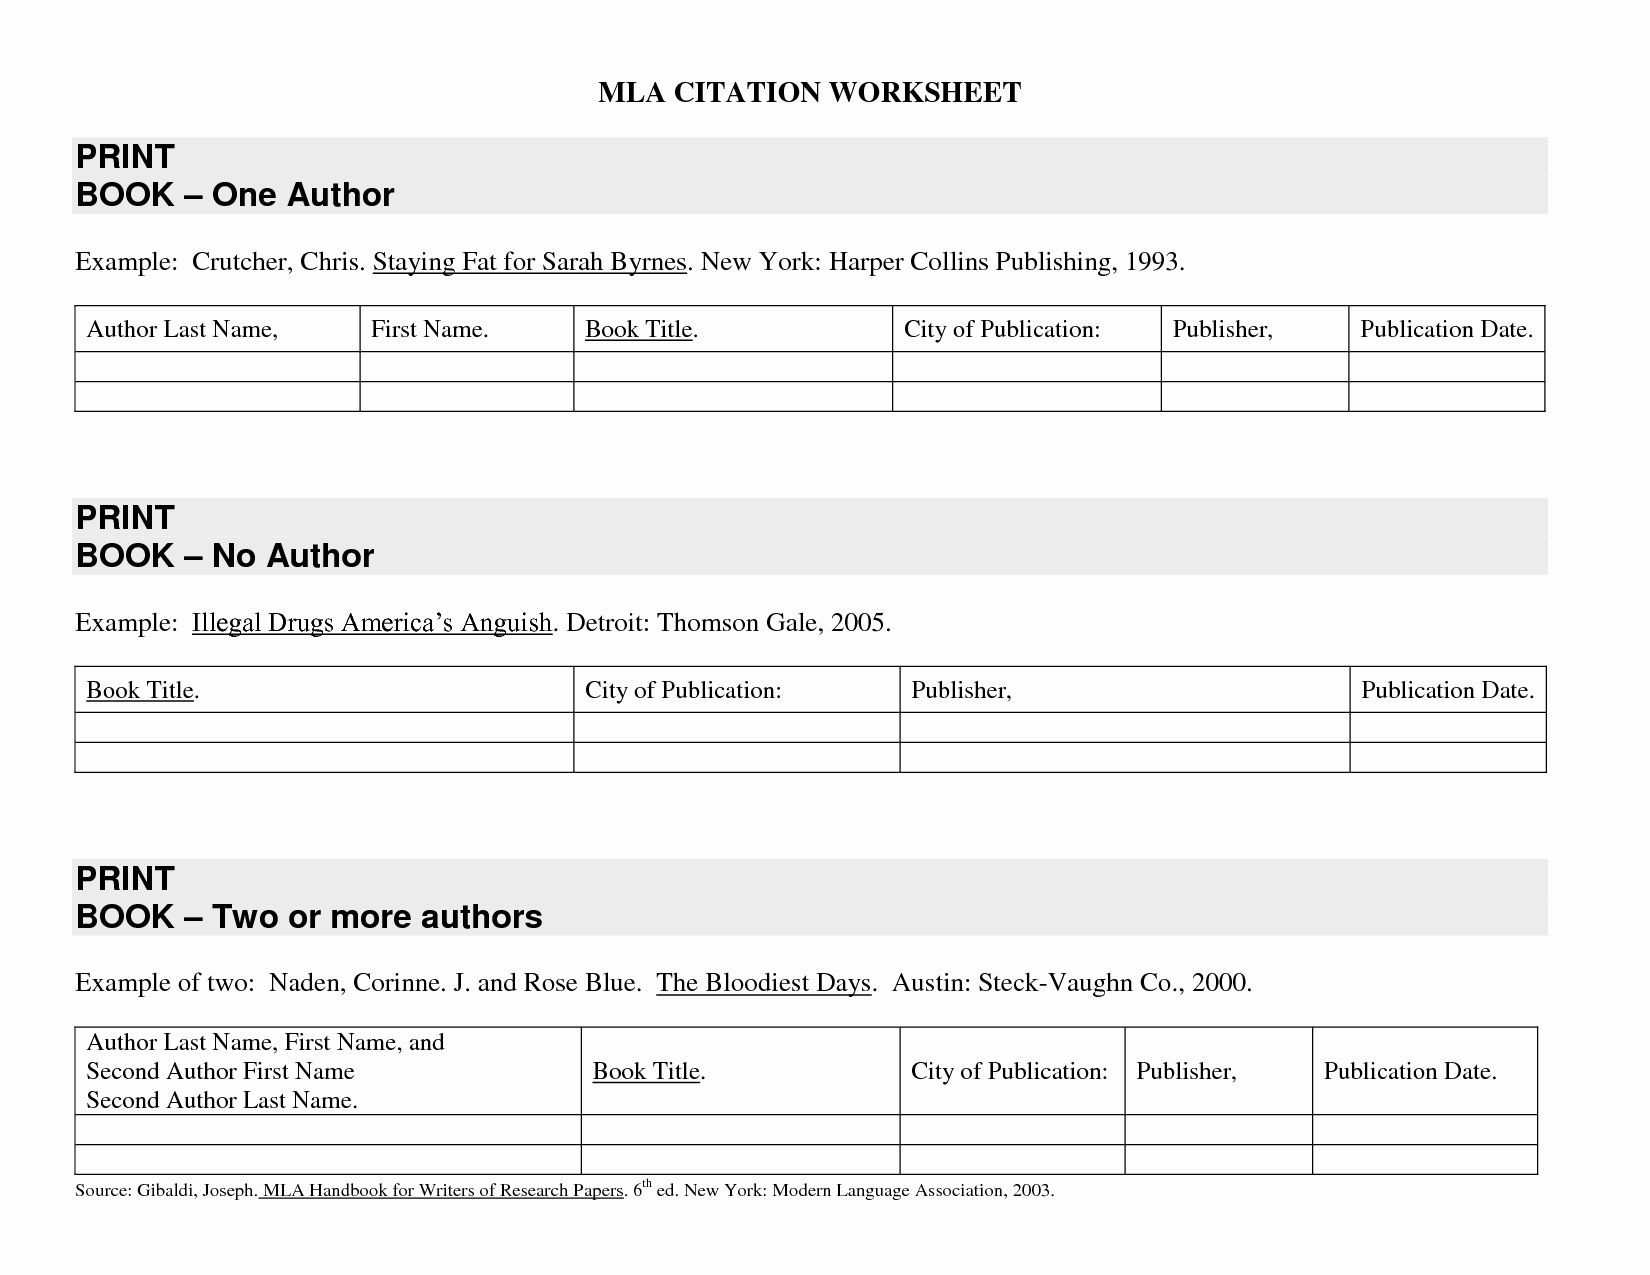 50 Mla Citation Practice Worksheet in 2020